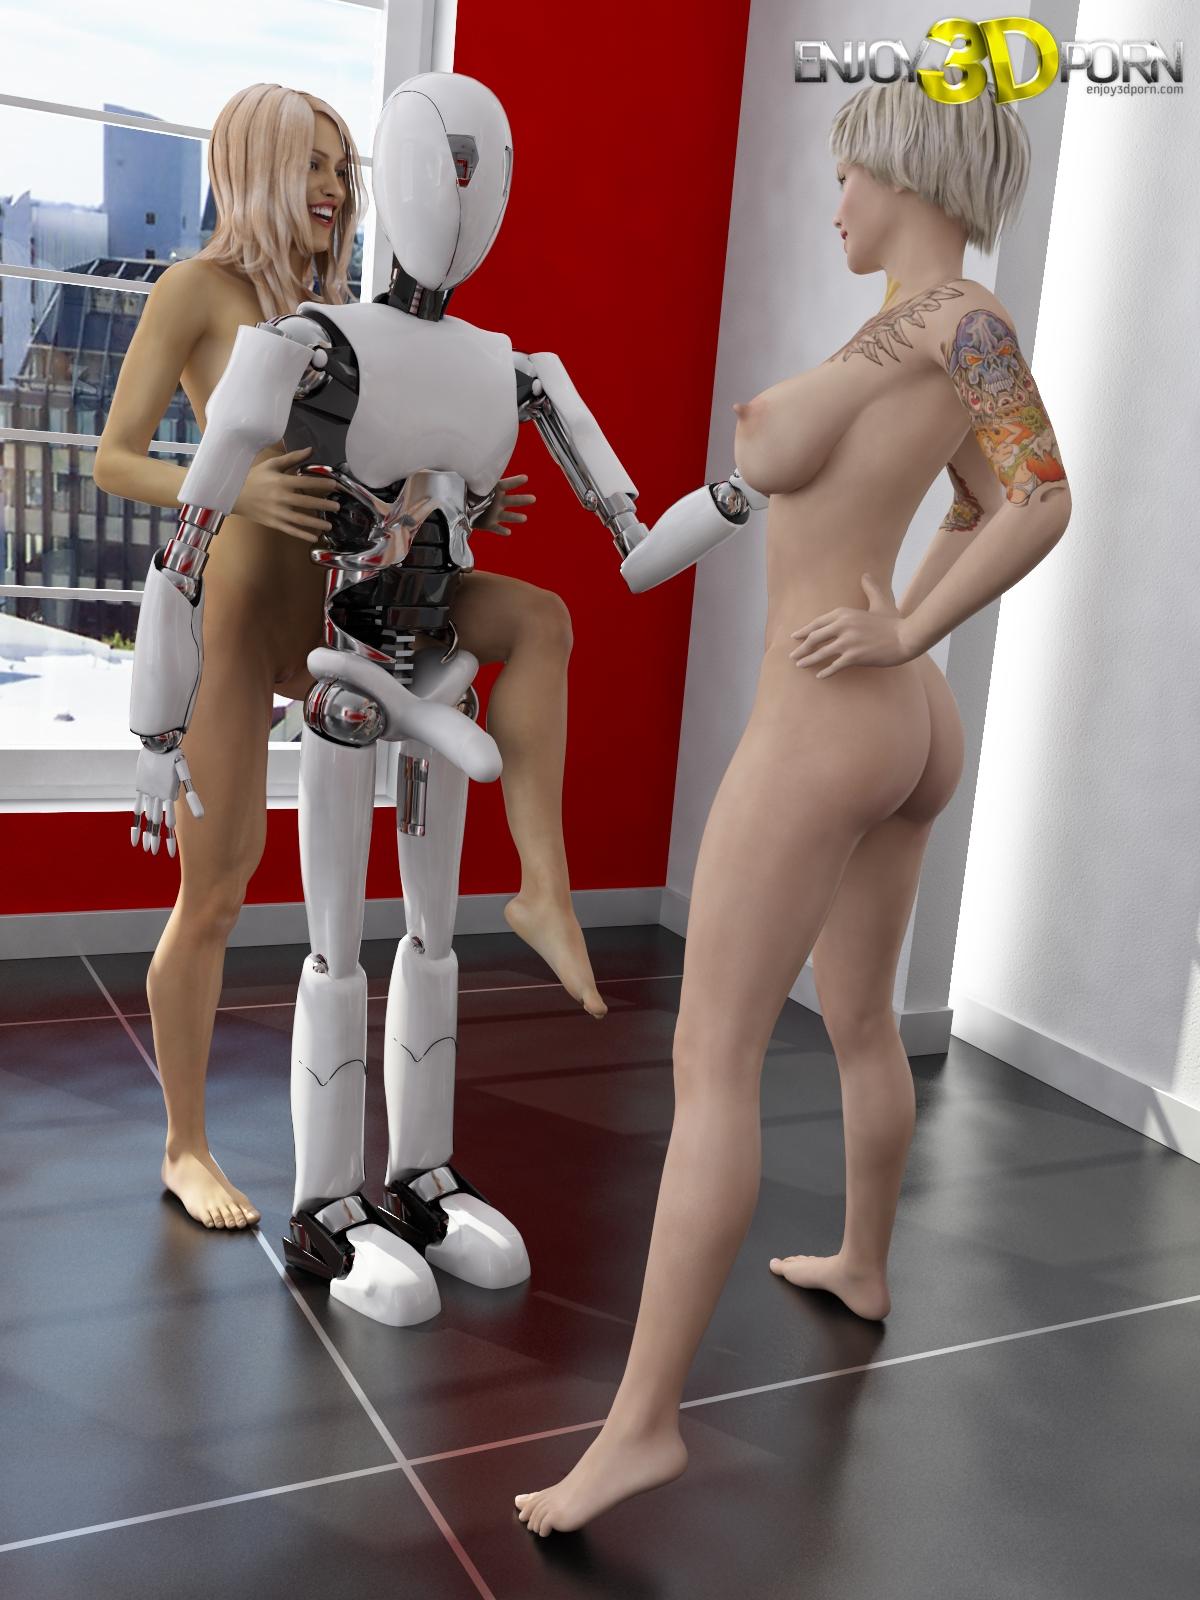 Extreme scifi porn nude photo